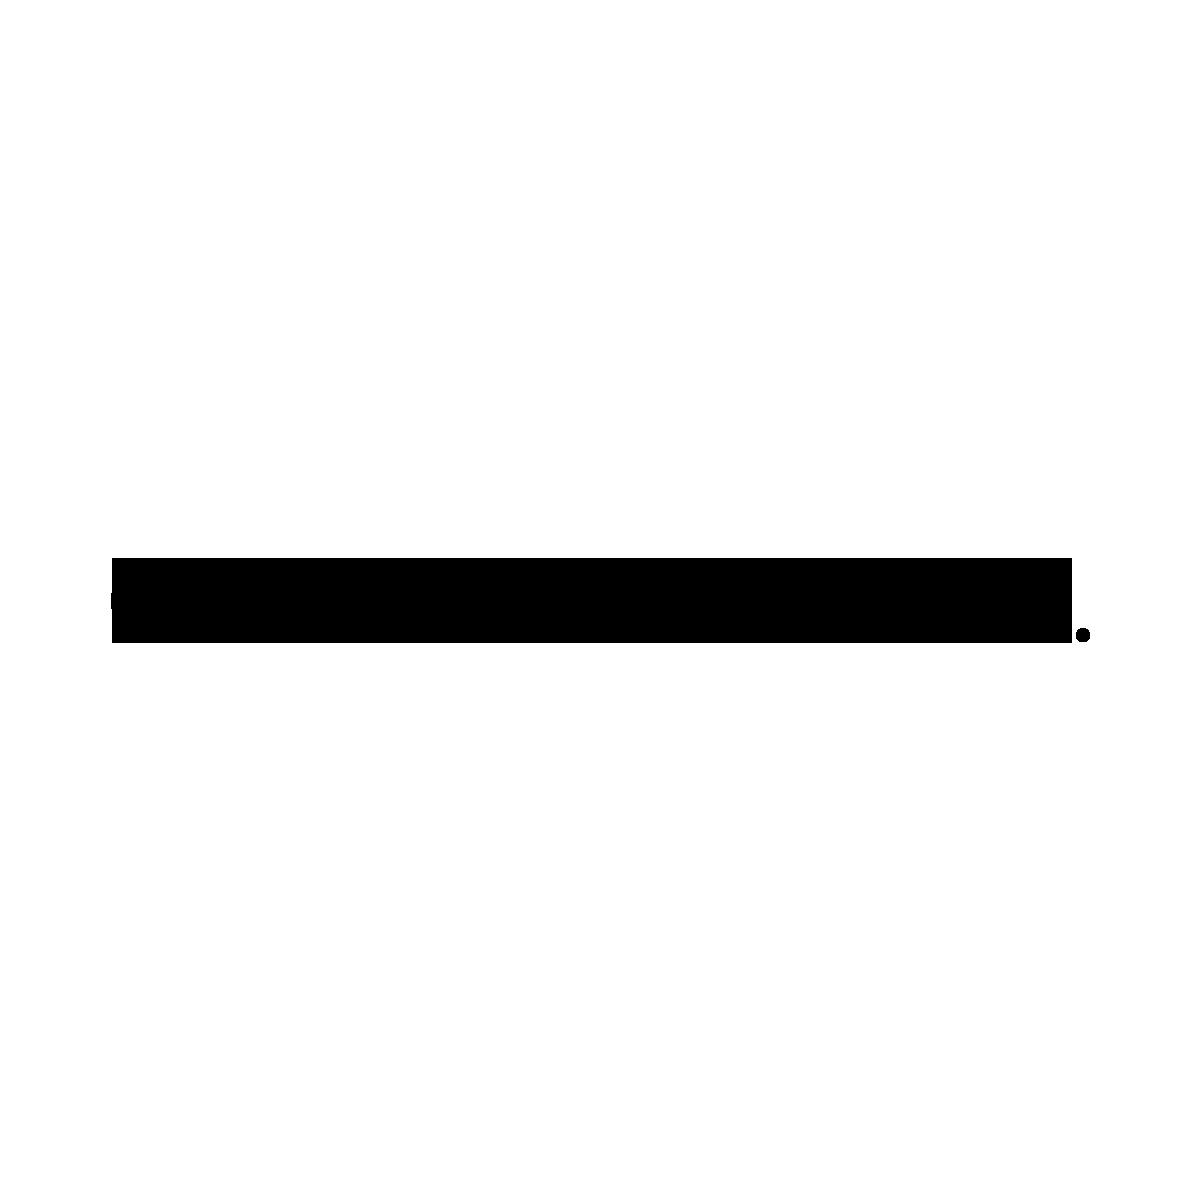 Sneaker-Fuoco-Schwarz